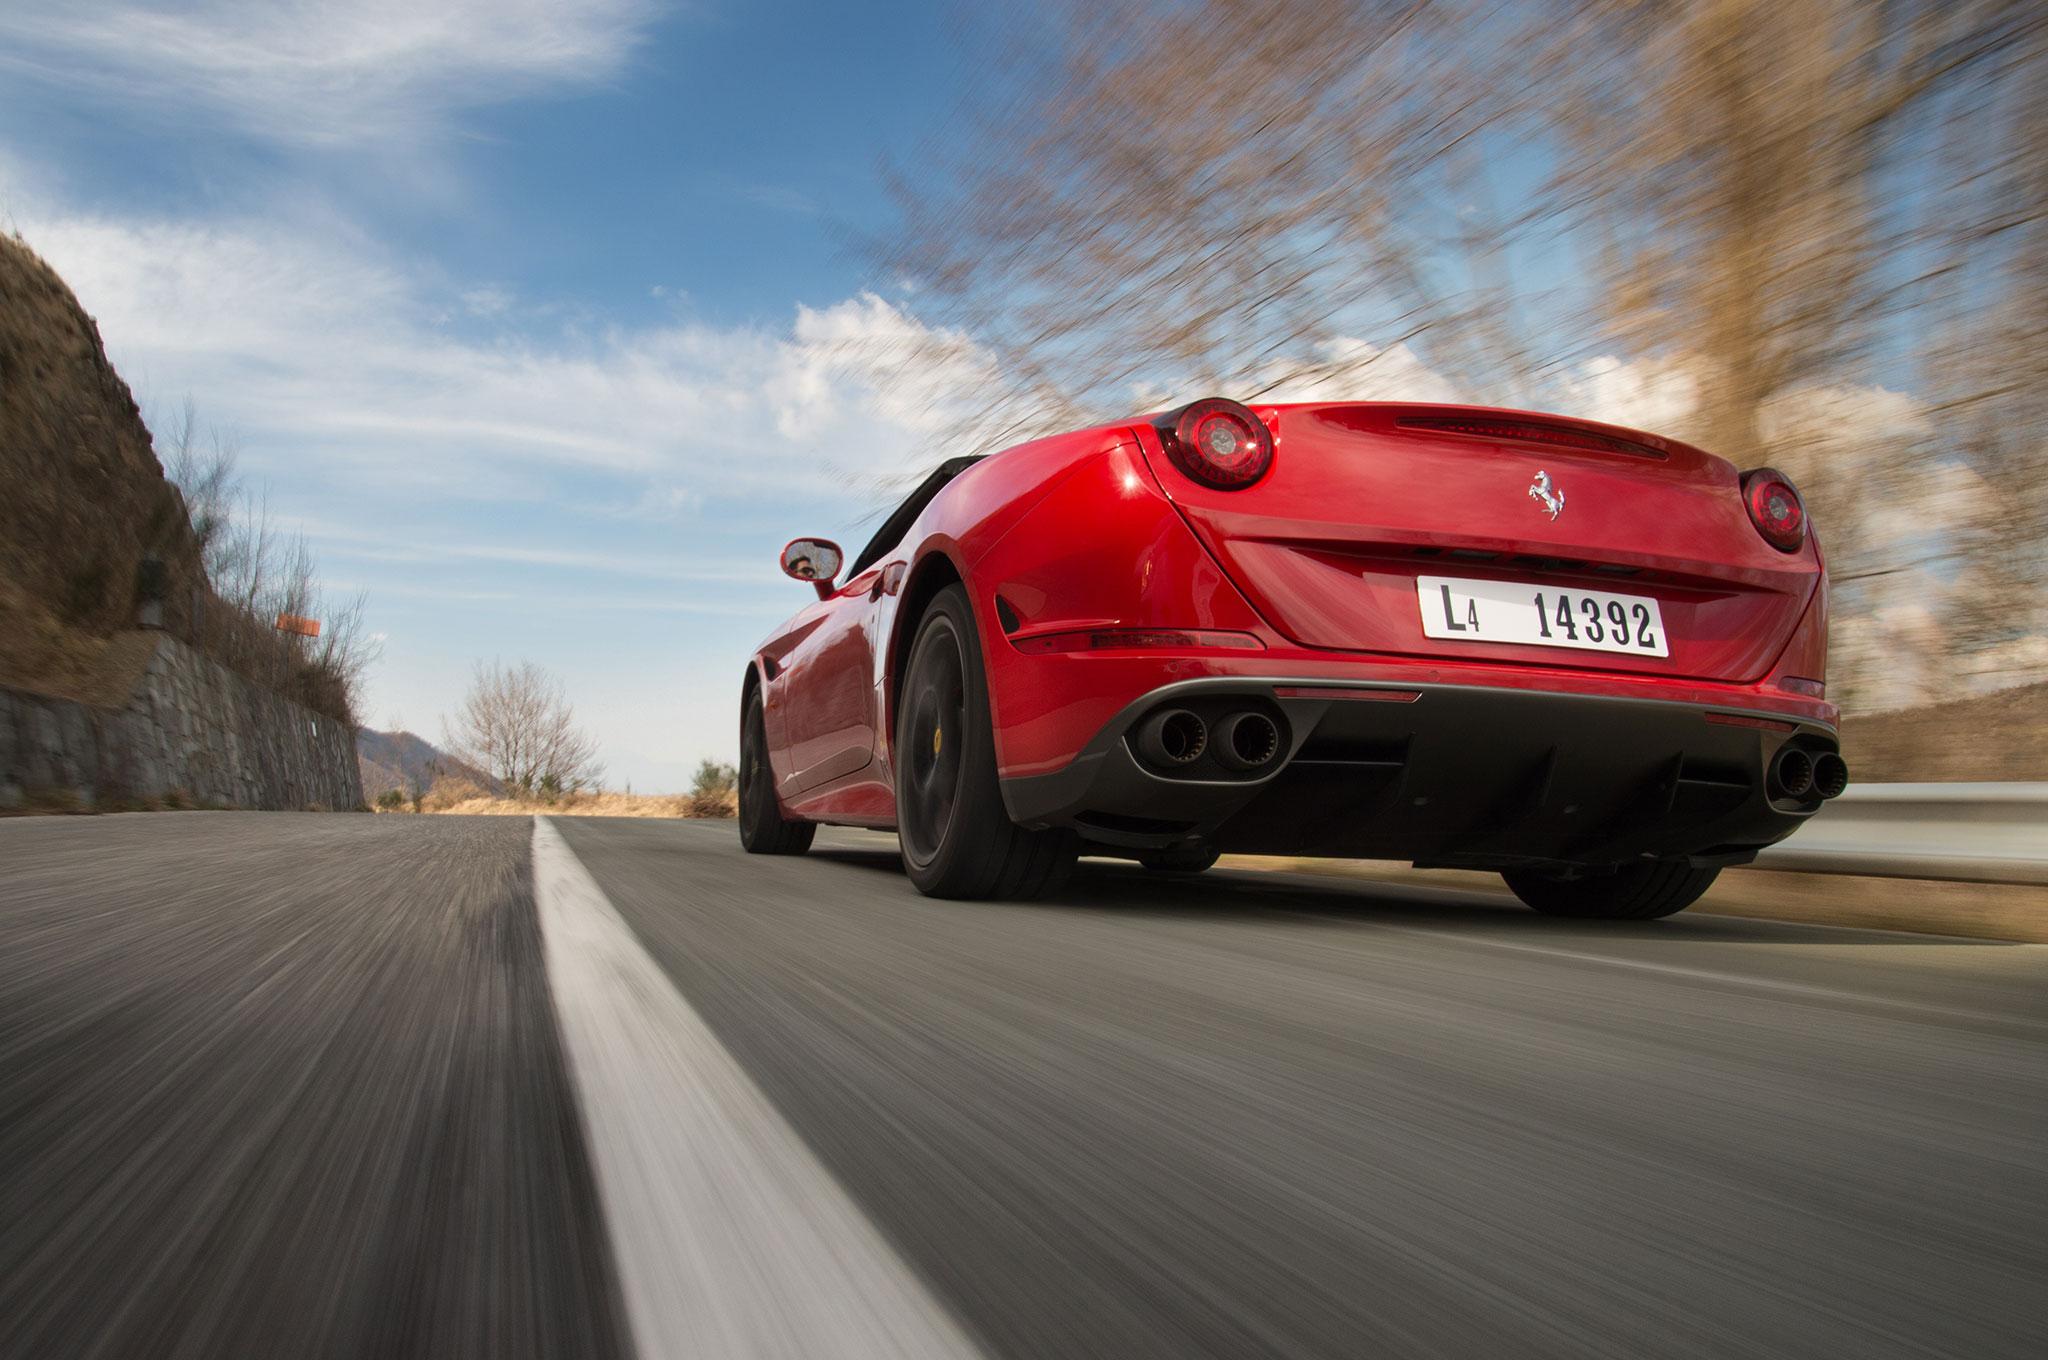 2016-Ferrari-California-T-Handling-Speciale-rear-three-quarter-in-motion-01.jpg